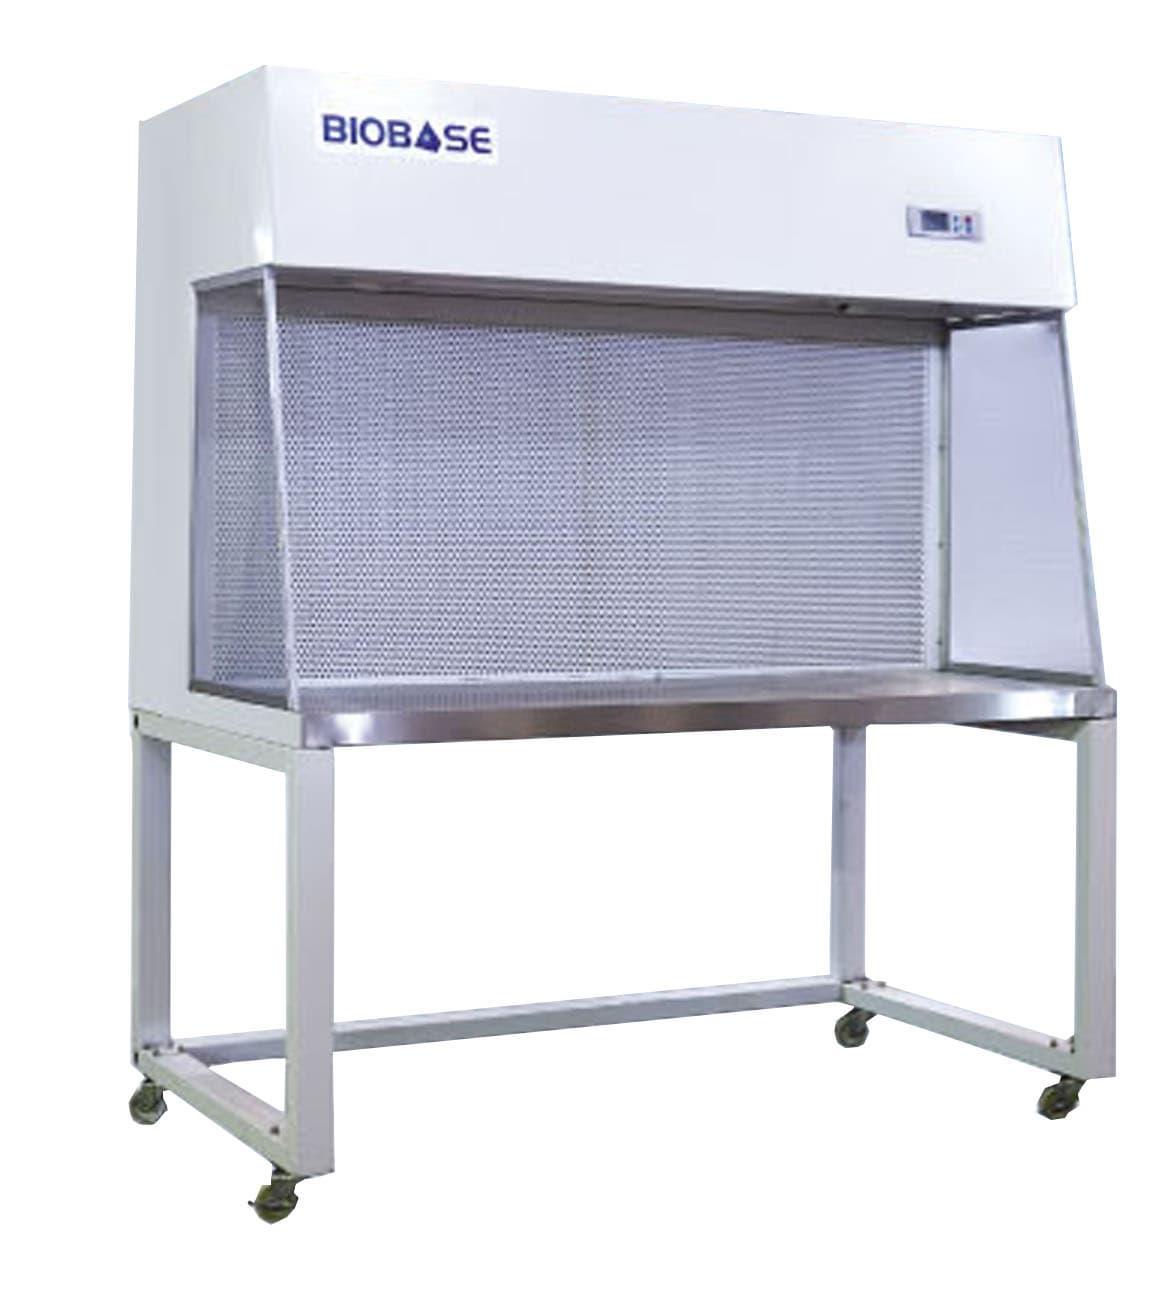 laminar flow clean bench from jinan biobase biotech co